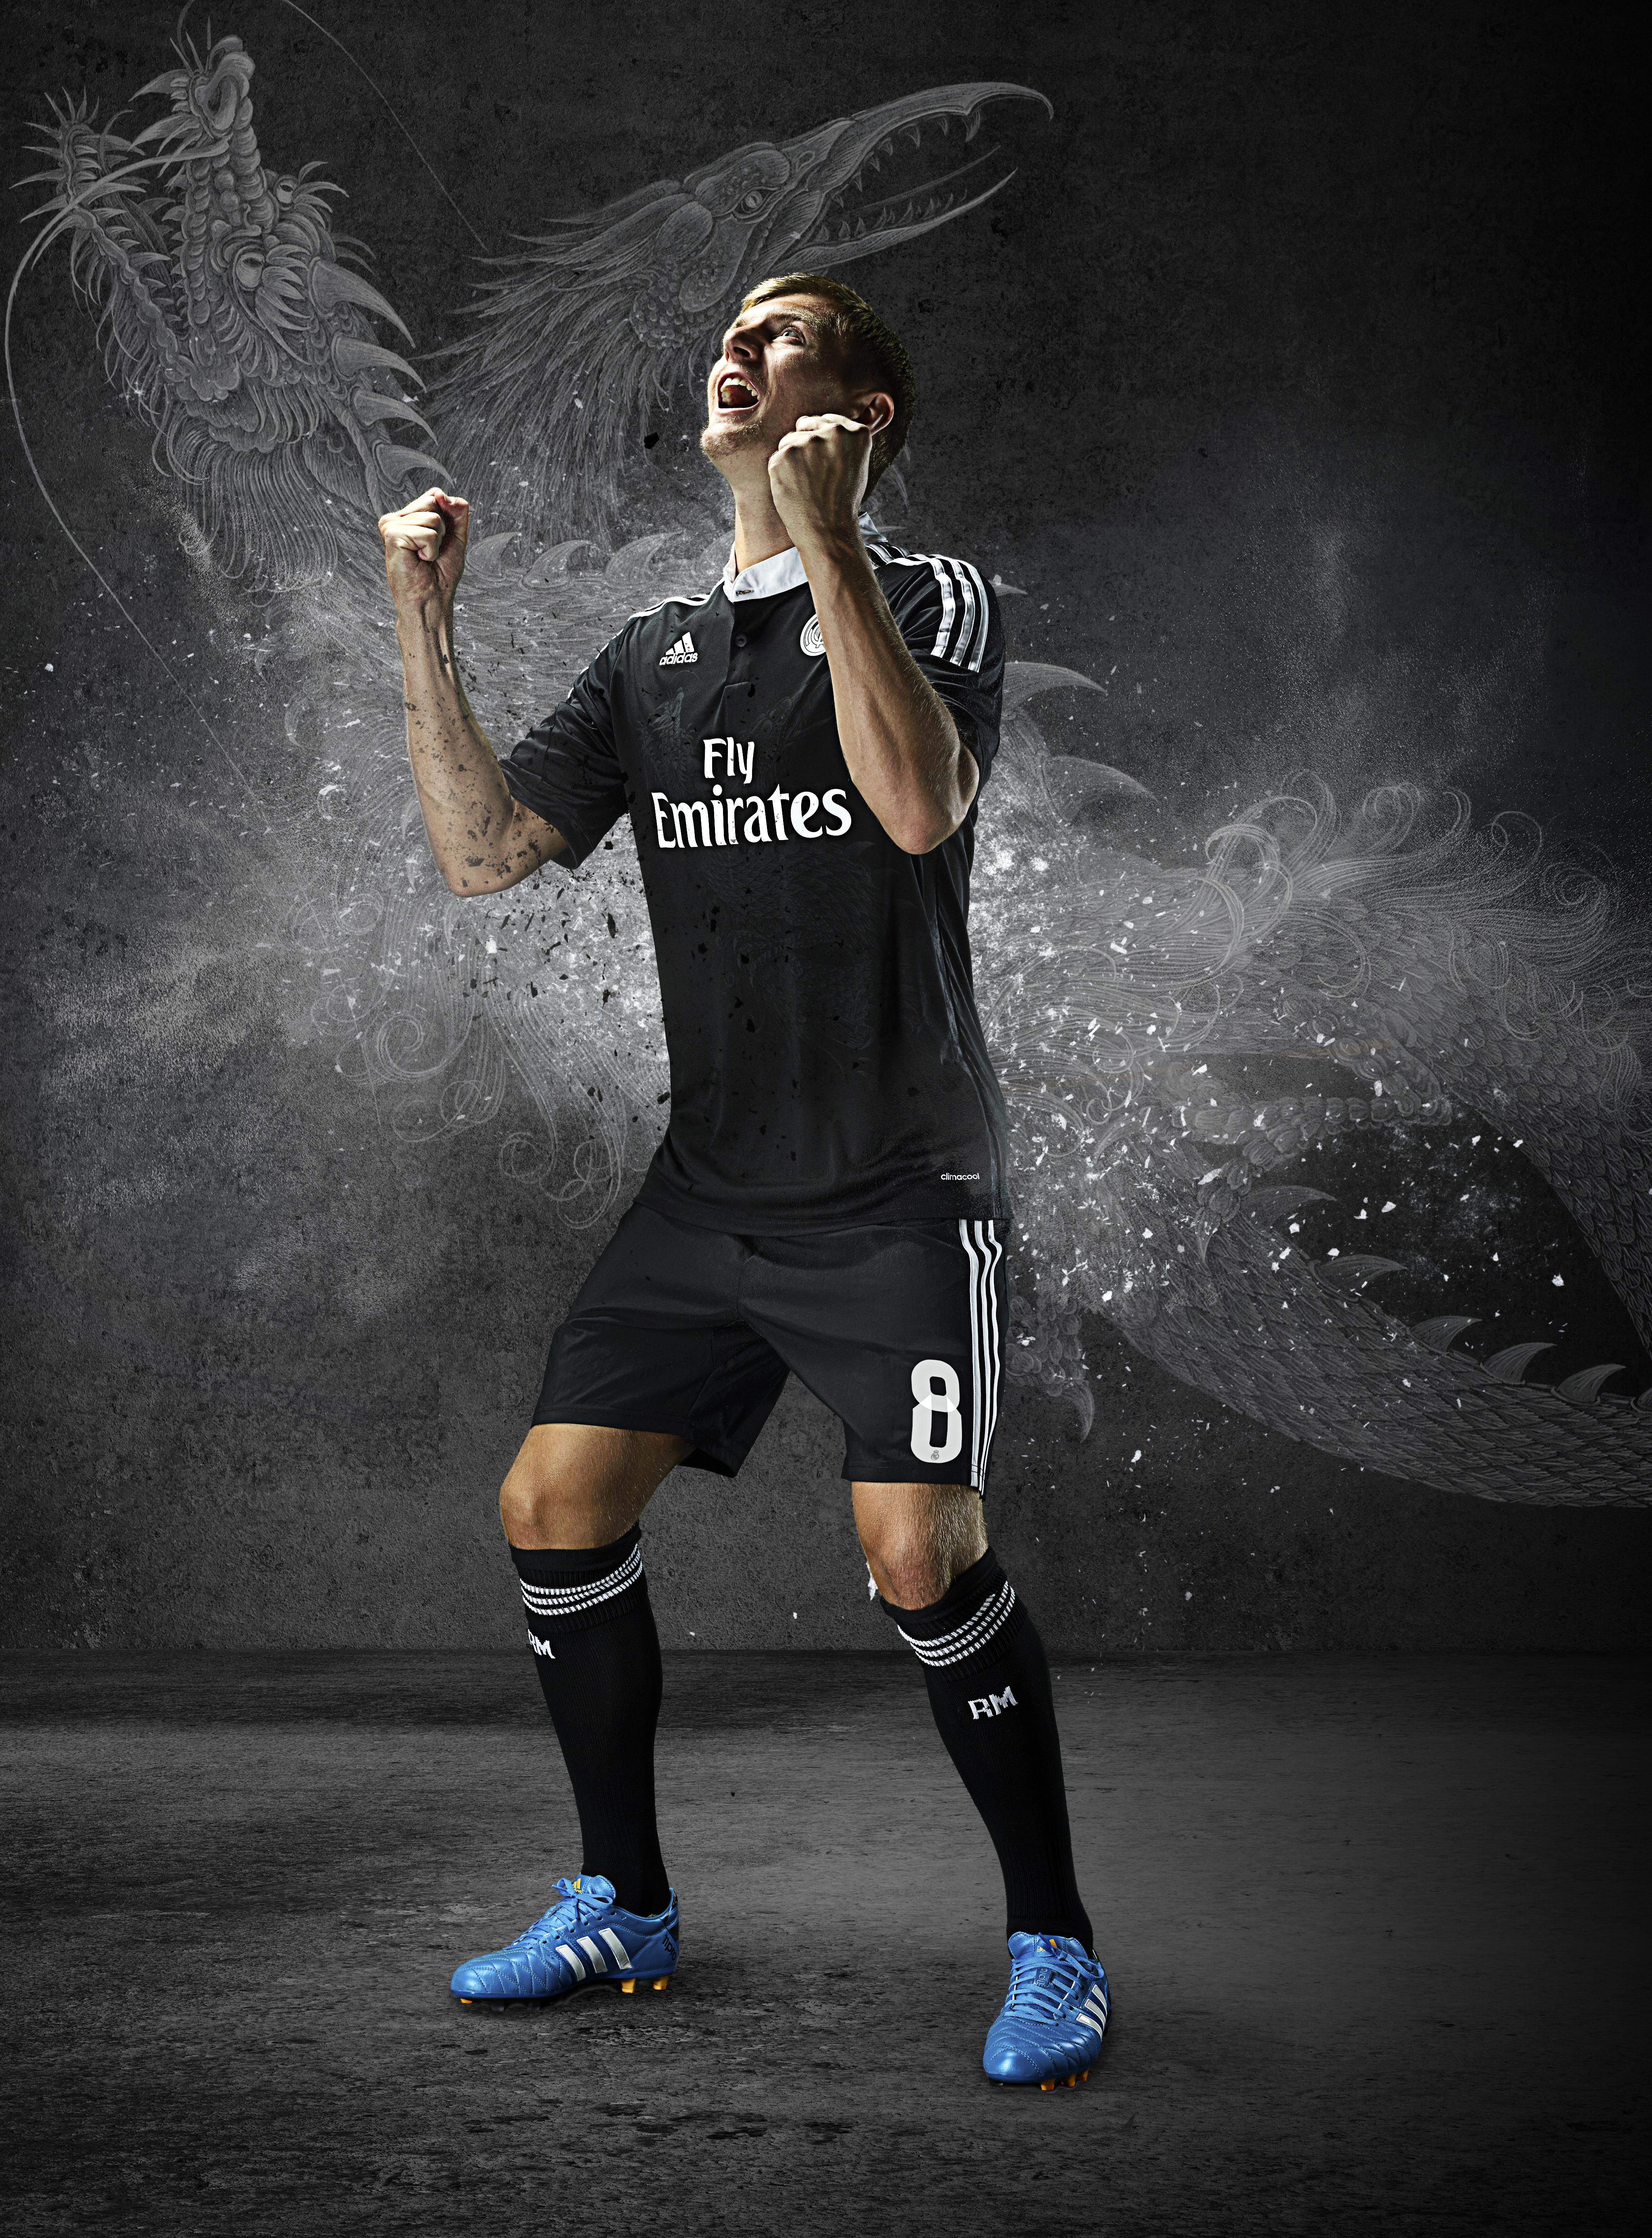 c7f51cd18ca3 Football kit release  adidas launch new Yohji Yamamoto designed Real ...